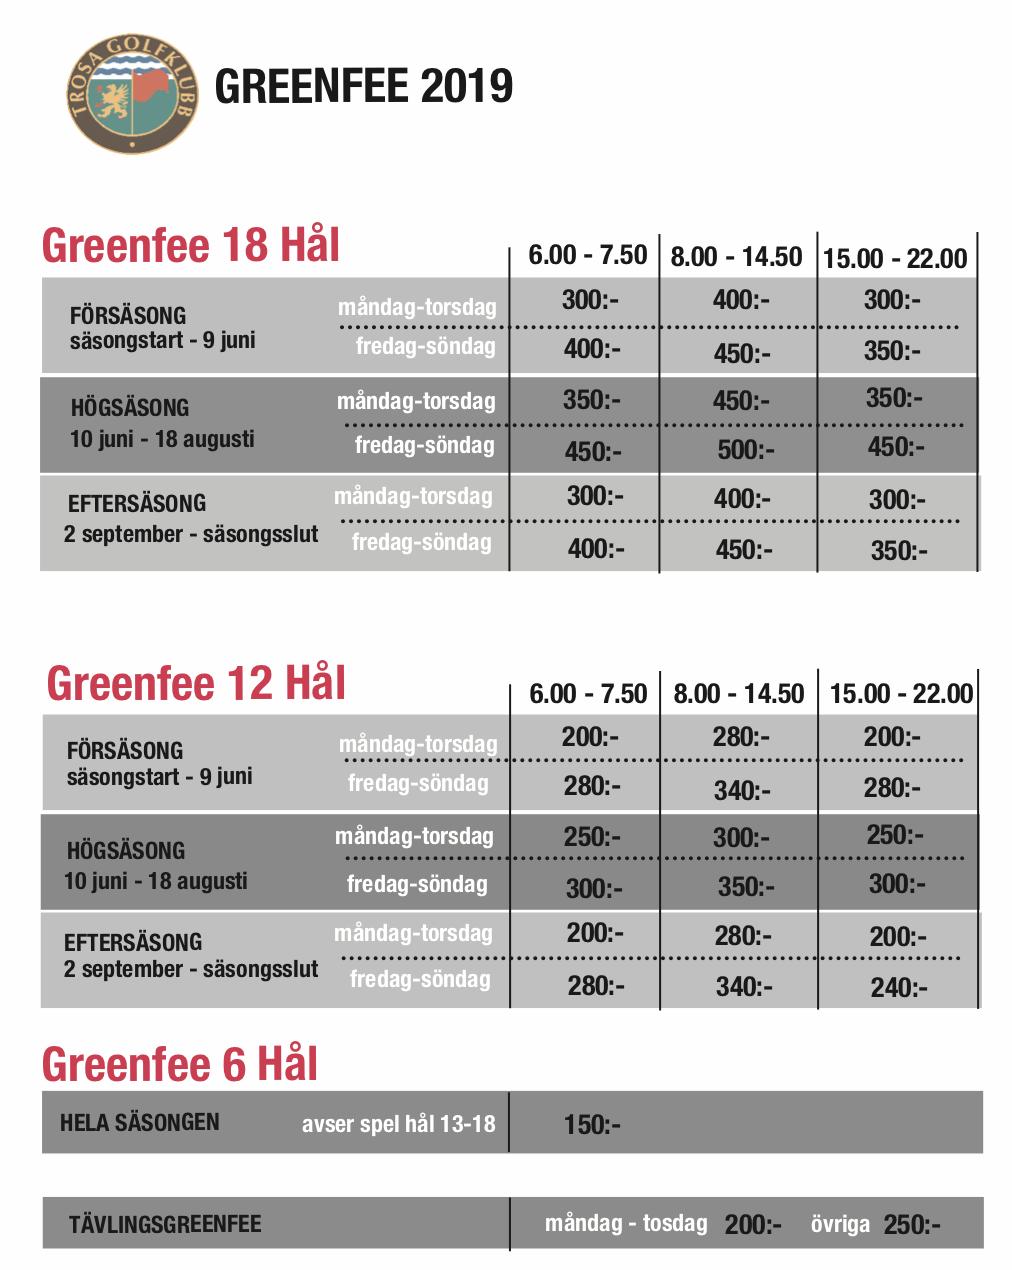 Greenfee 2019